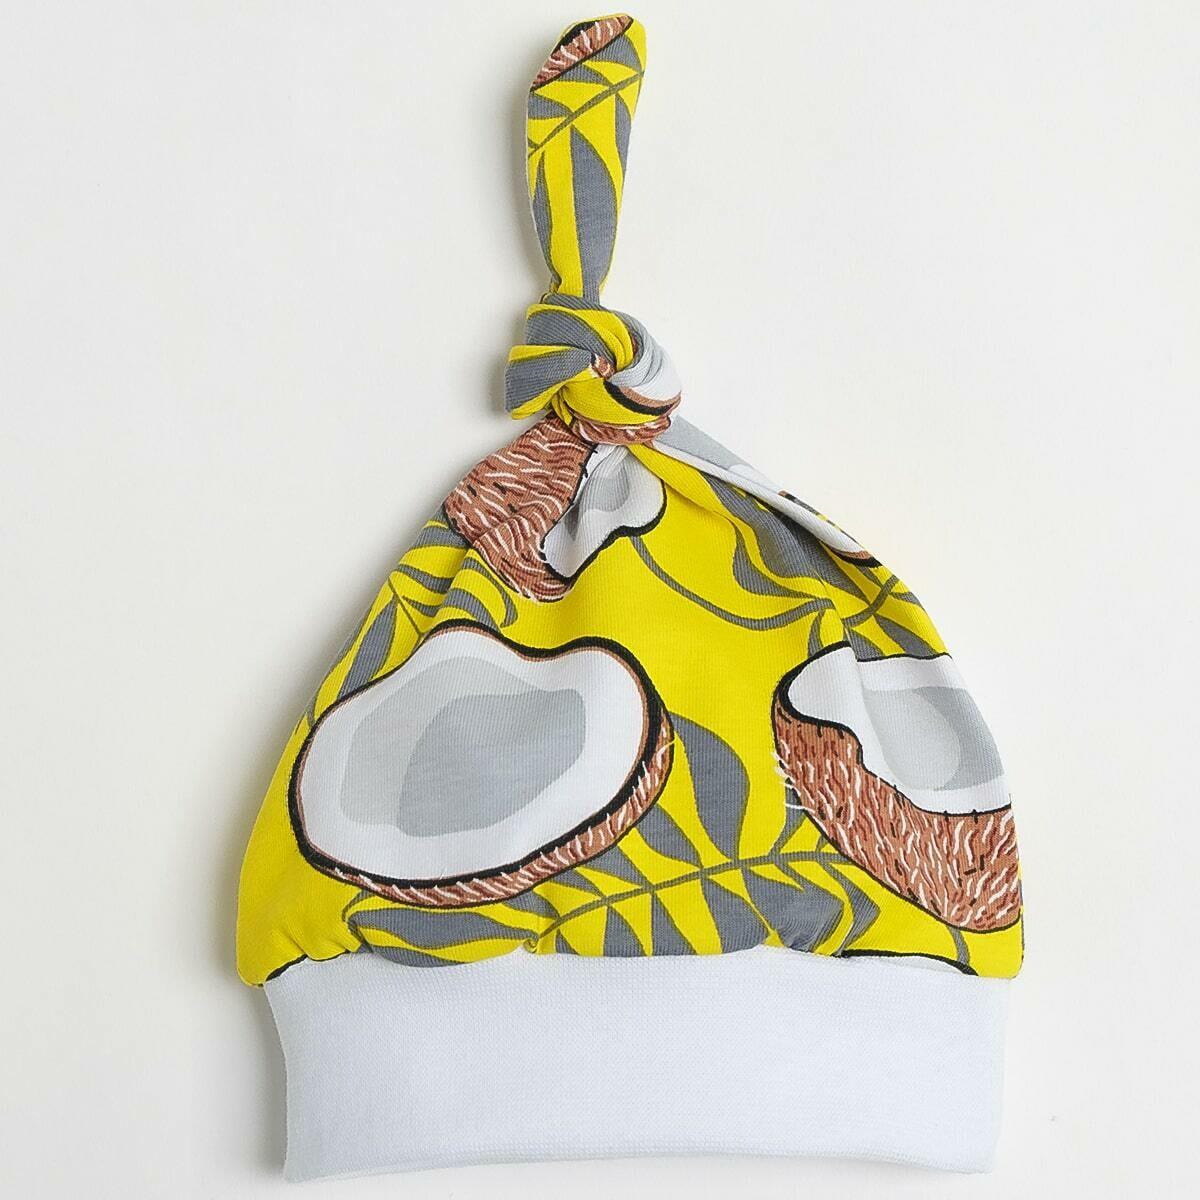 Шапочка с узелком, тонкий трикотаж, кокосы, желтый